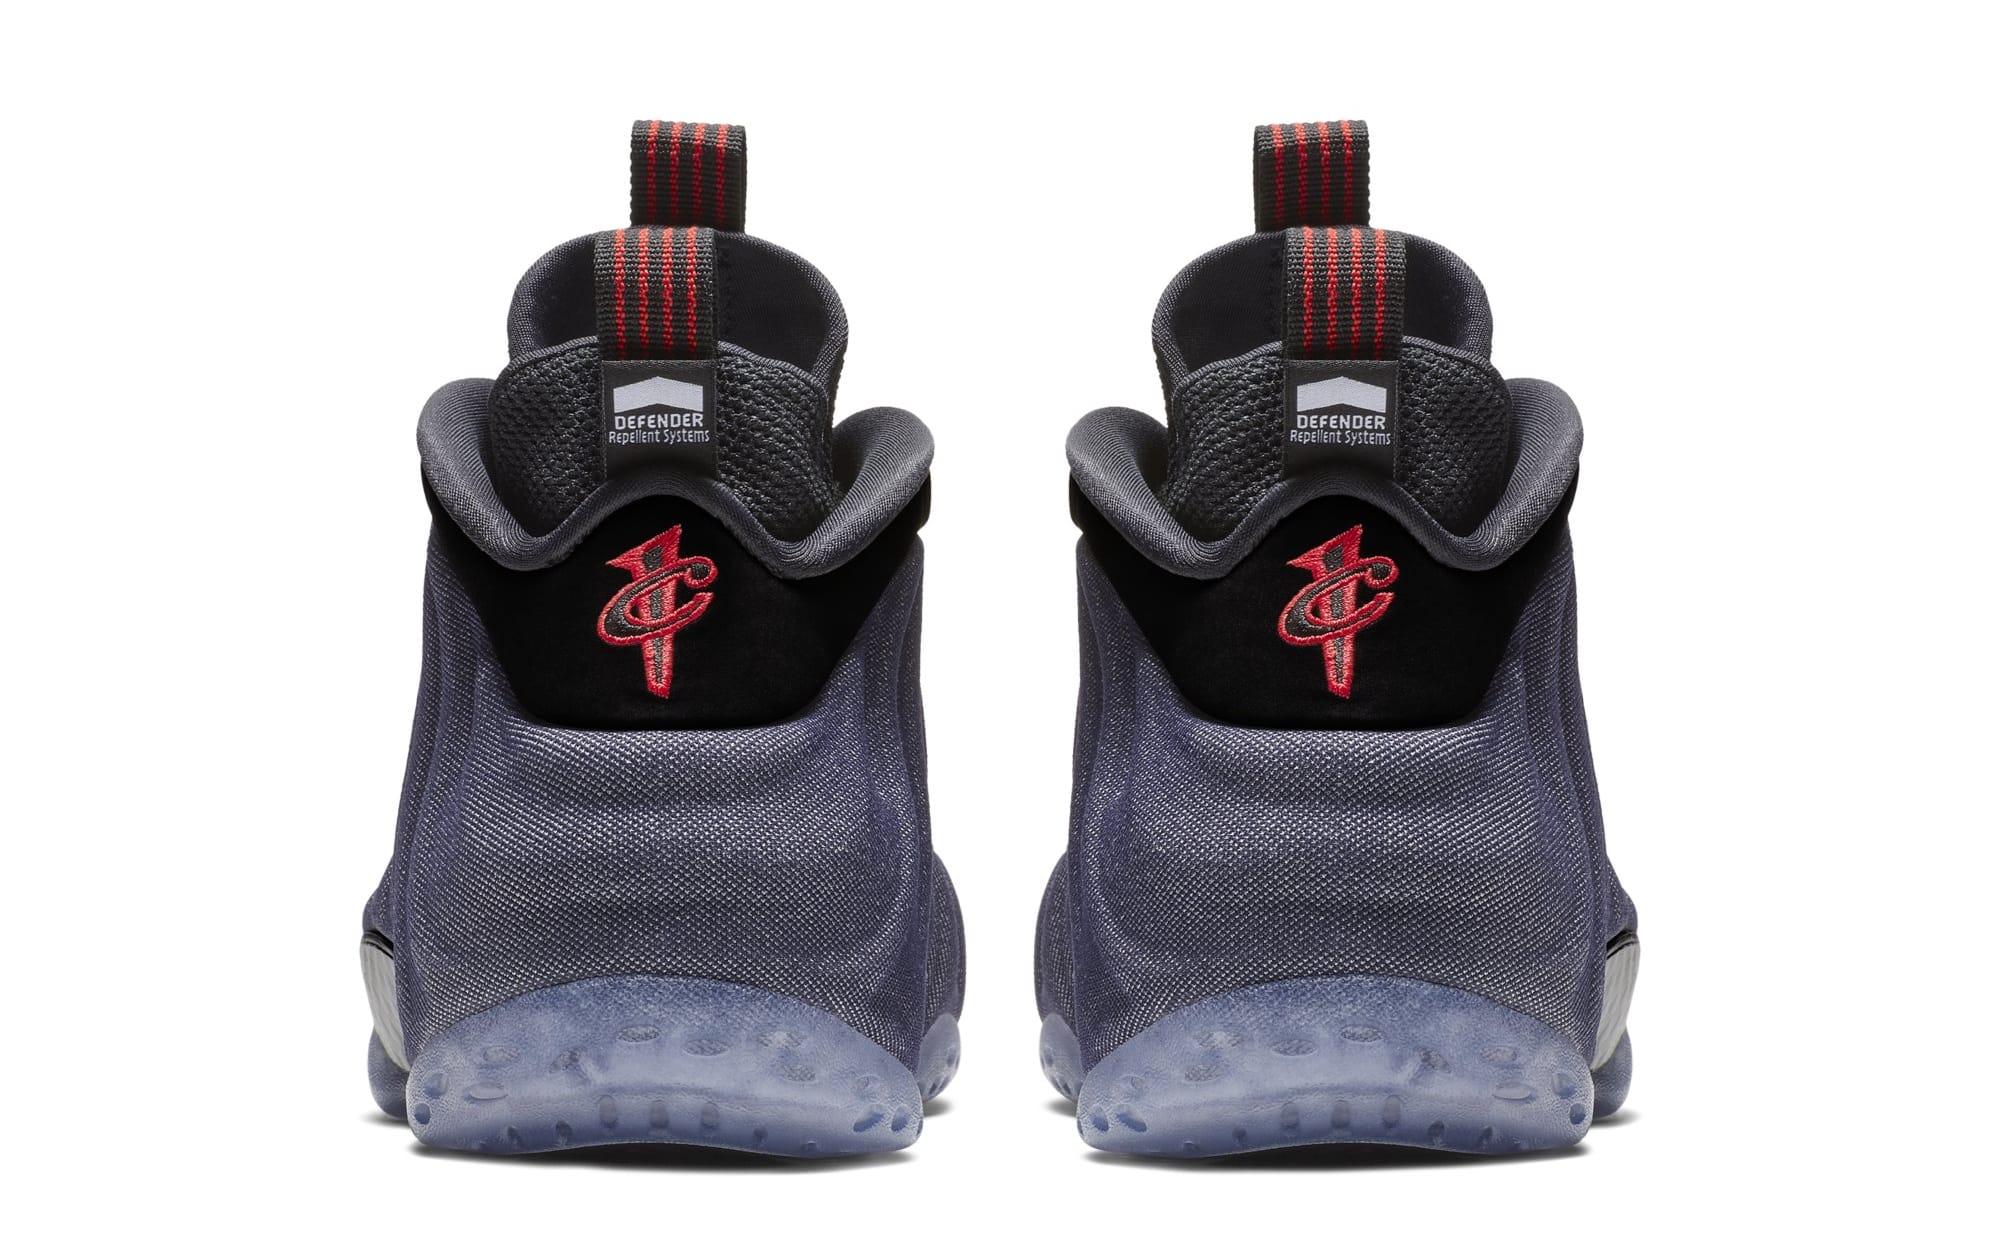 bd170014fab Nike s Denim-Covered Foamposites Drop Next Week – USA News Hub